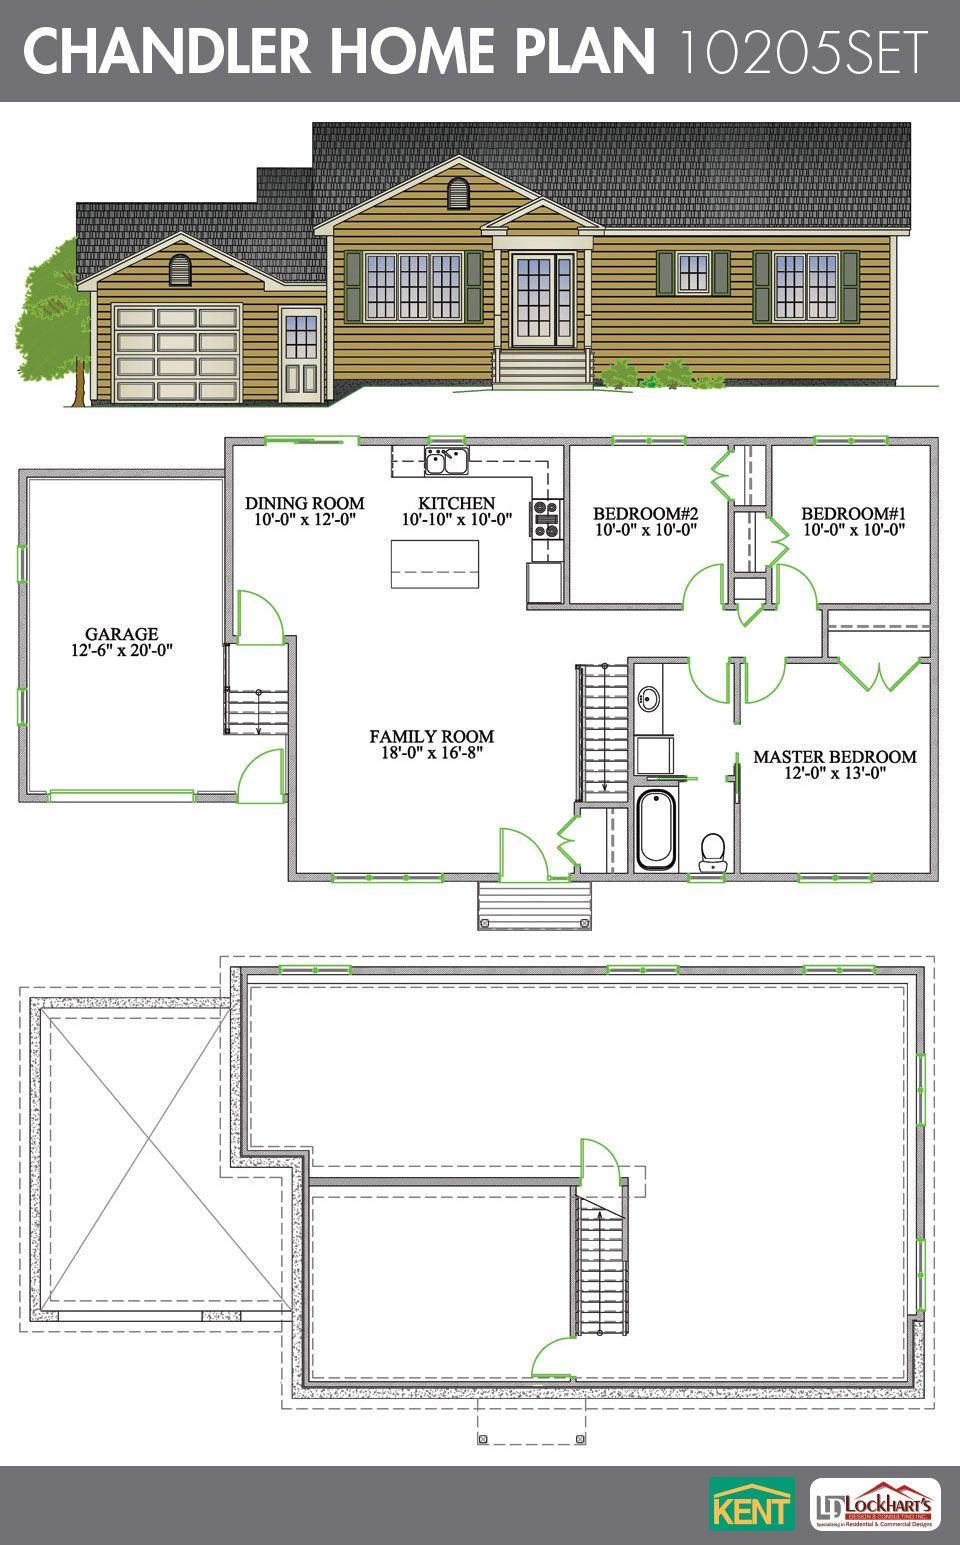 Chandler 3 Bedroom 1 Bathroom Home Plan Features Open Concept Living Room Dining Kitchen Master With Walk In Closet En Suite And Garage